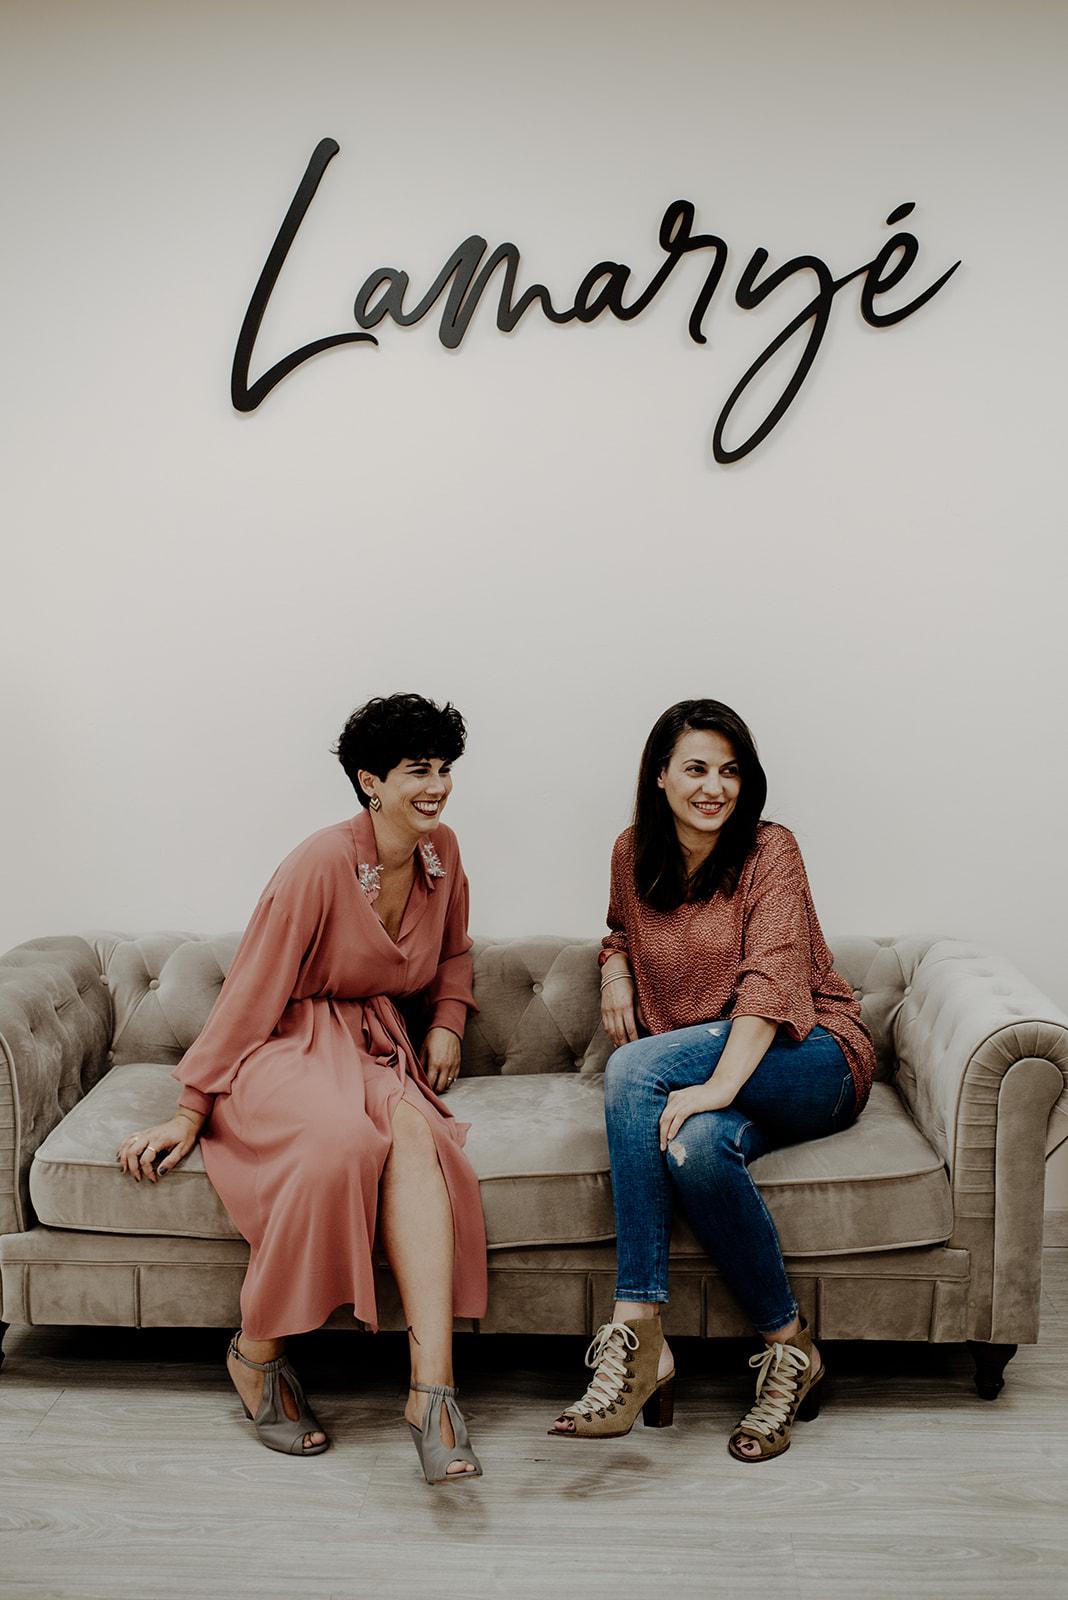 Entrevista a Lamaryé